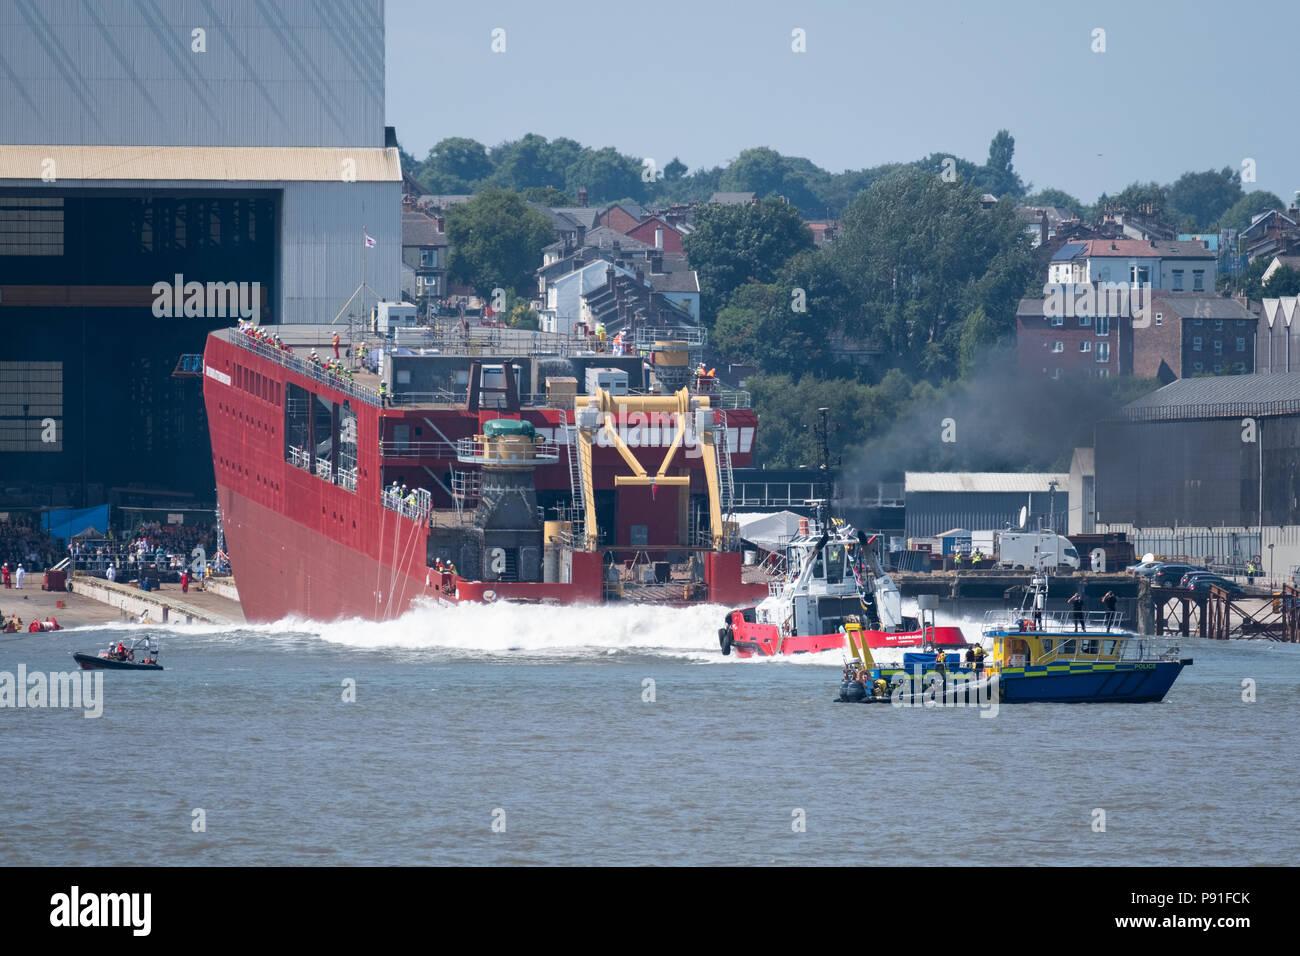 The new polar research ship, RRS Sir David Attenborough, the